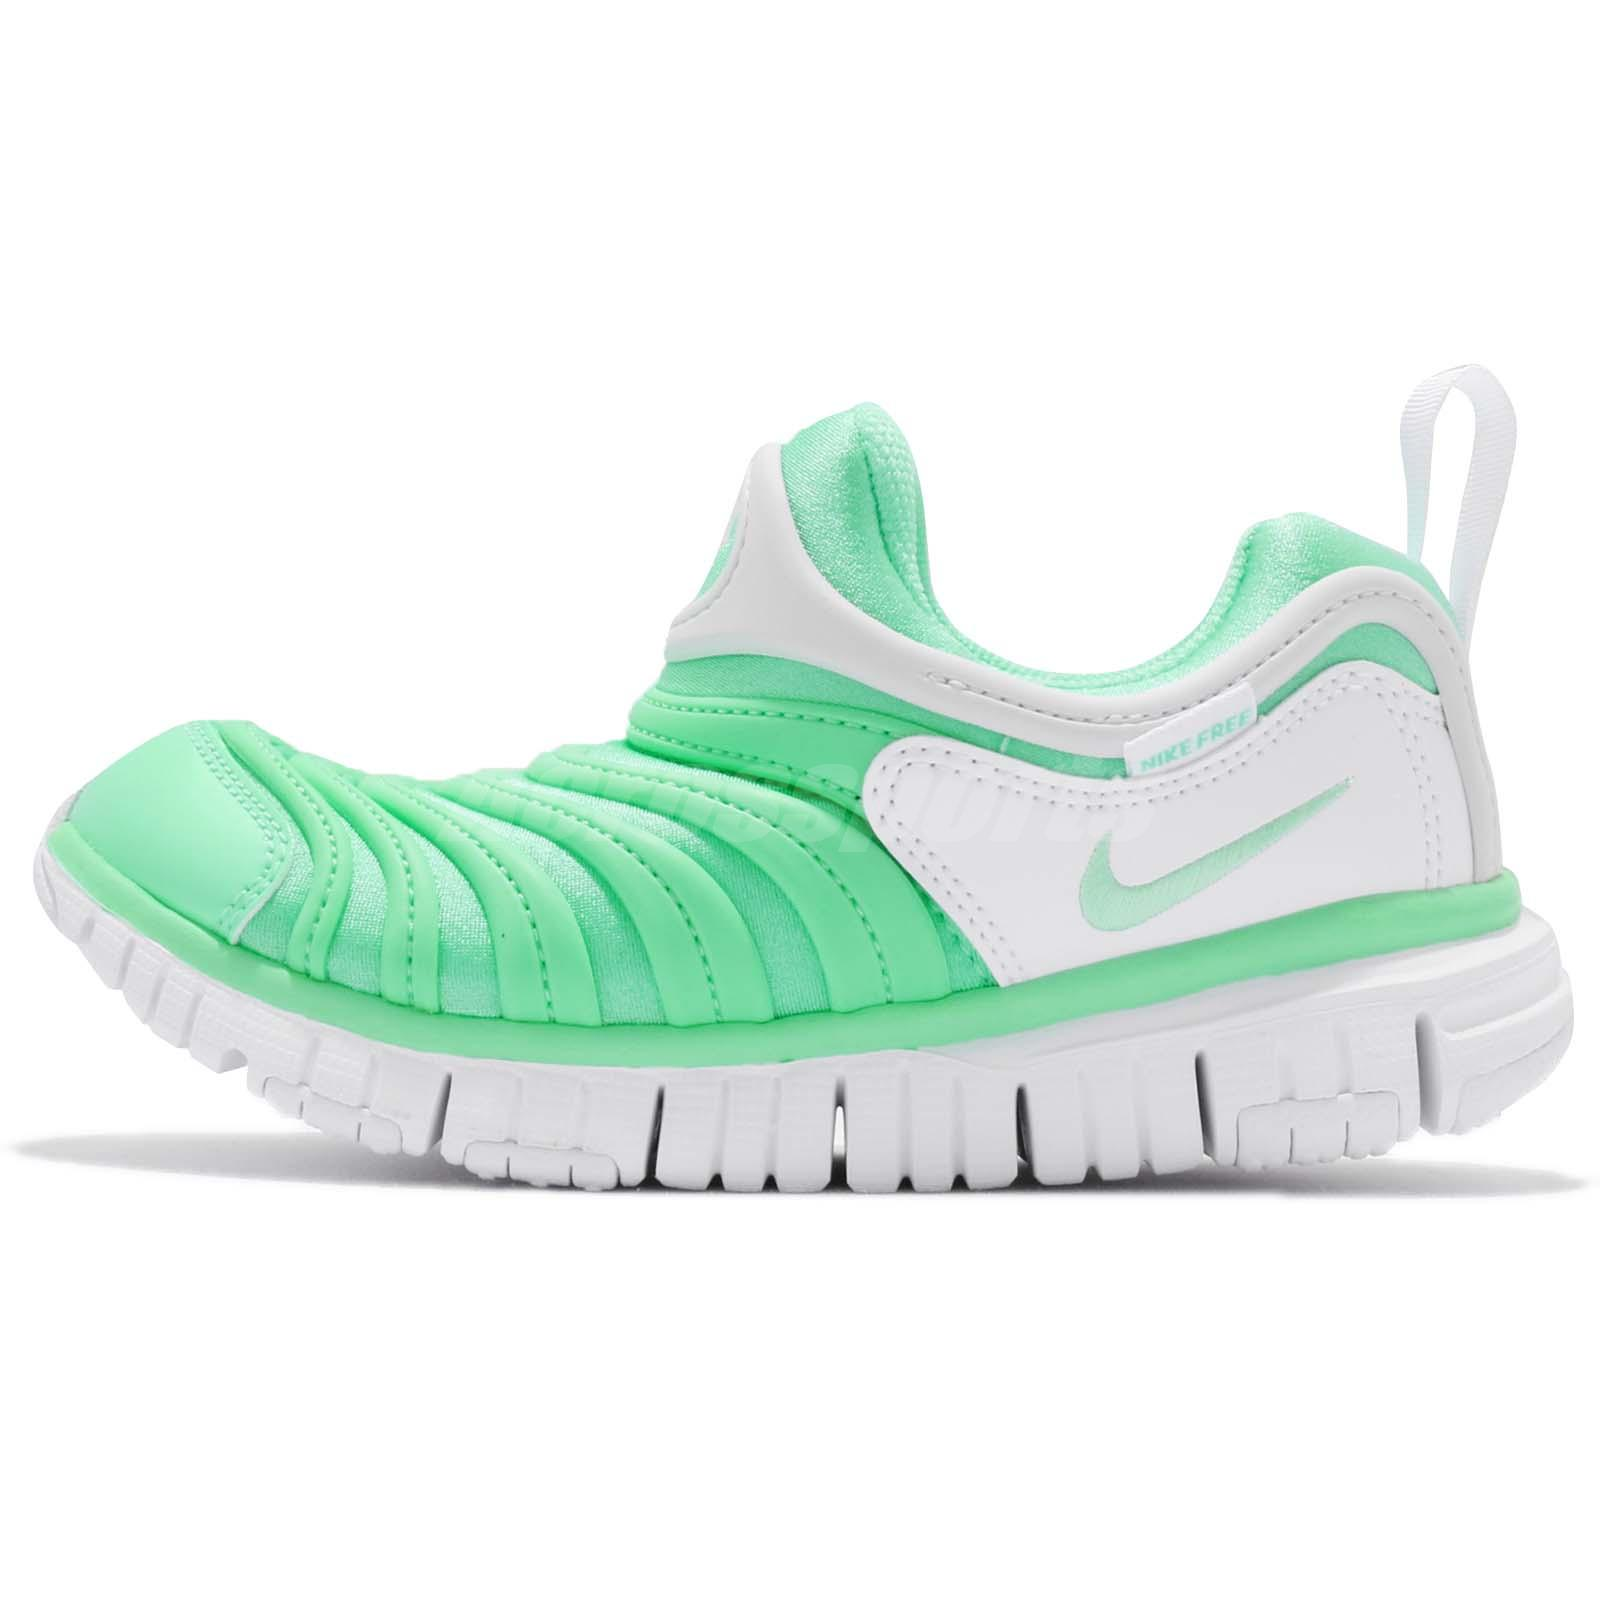 2eabcec9edc09 ... usa nike dynamo free ps green glow white preschool kids junior shoes  343738 309 bf9b0 15666